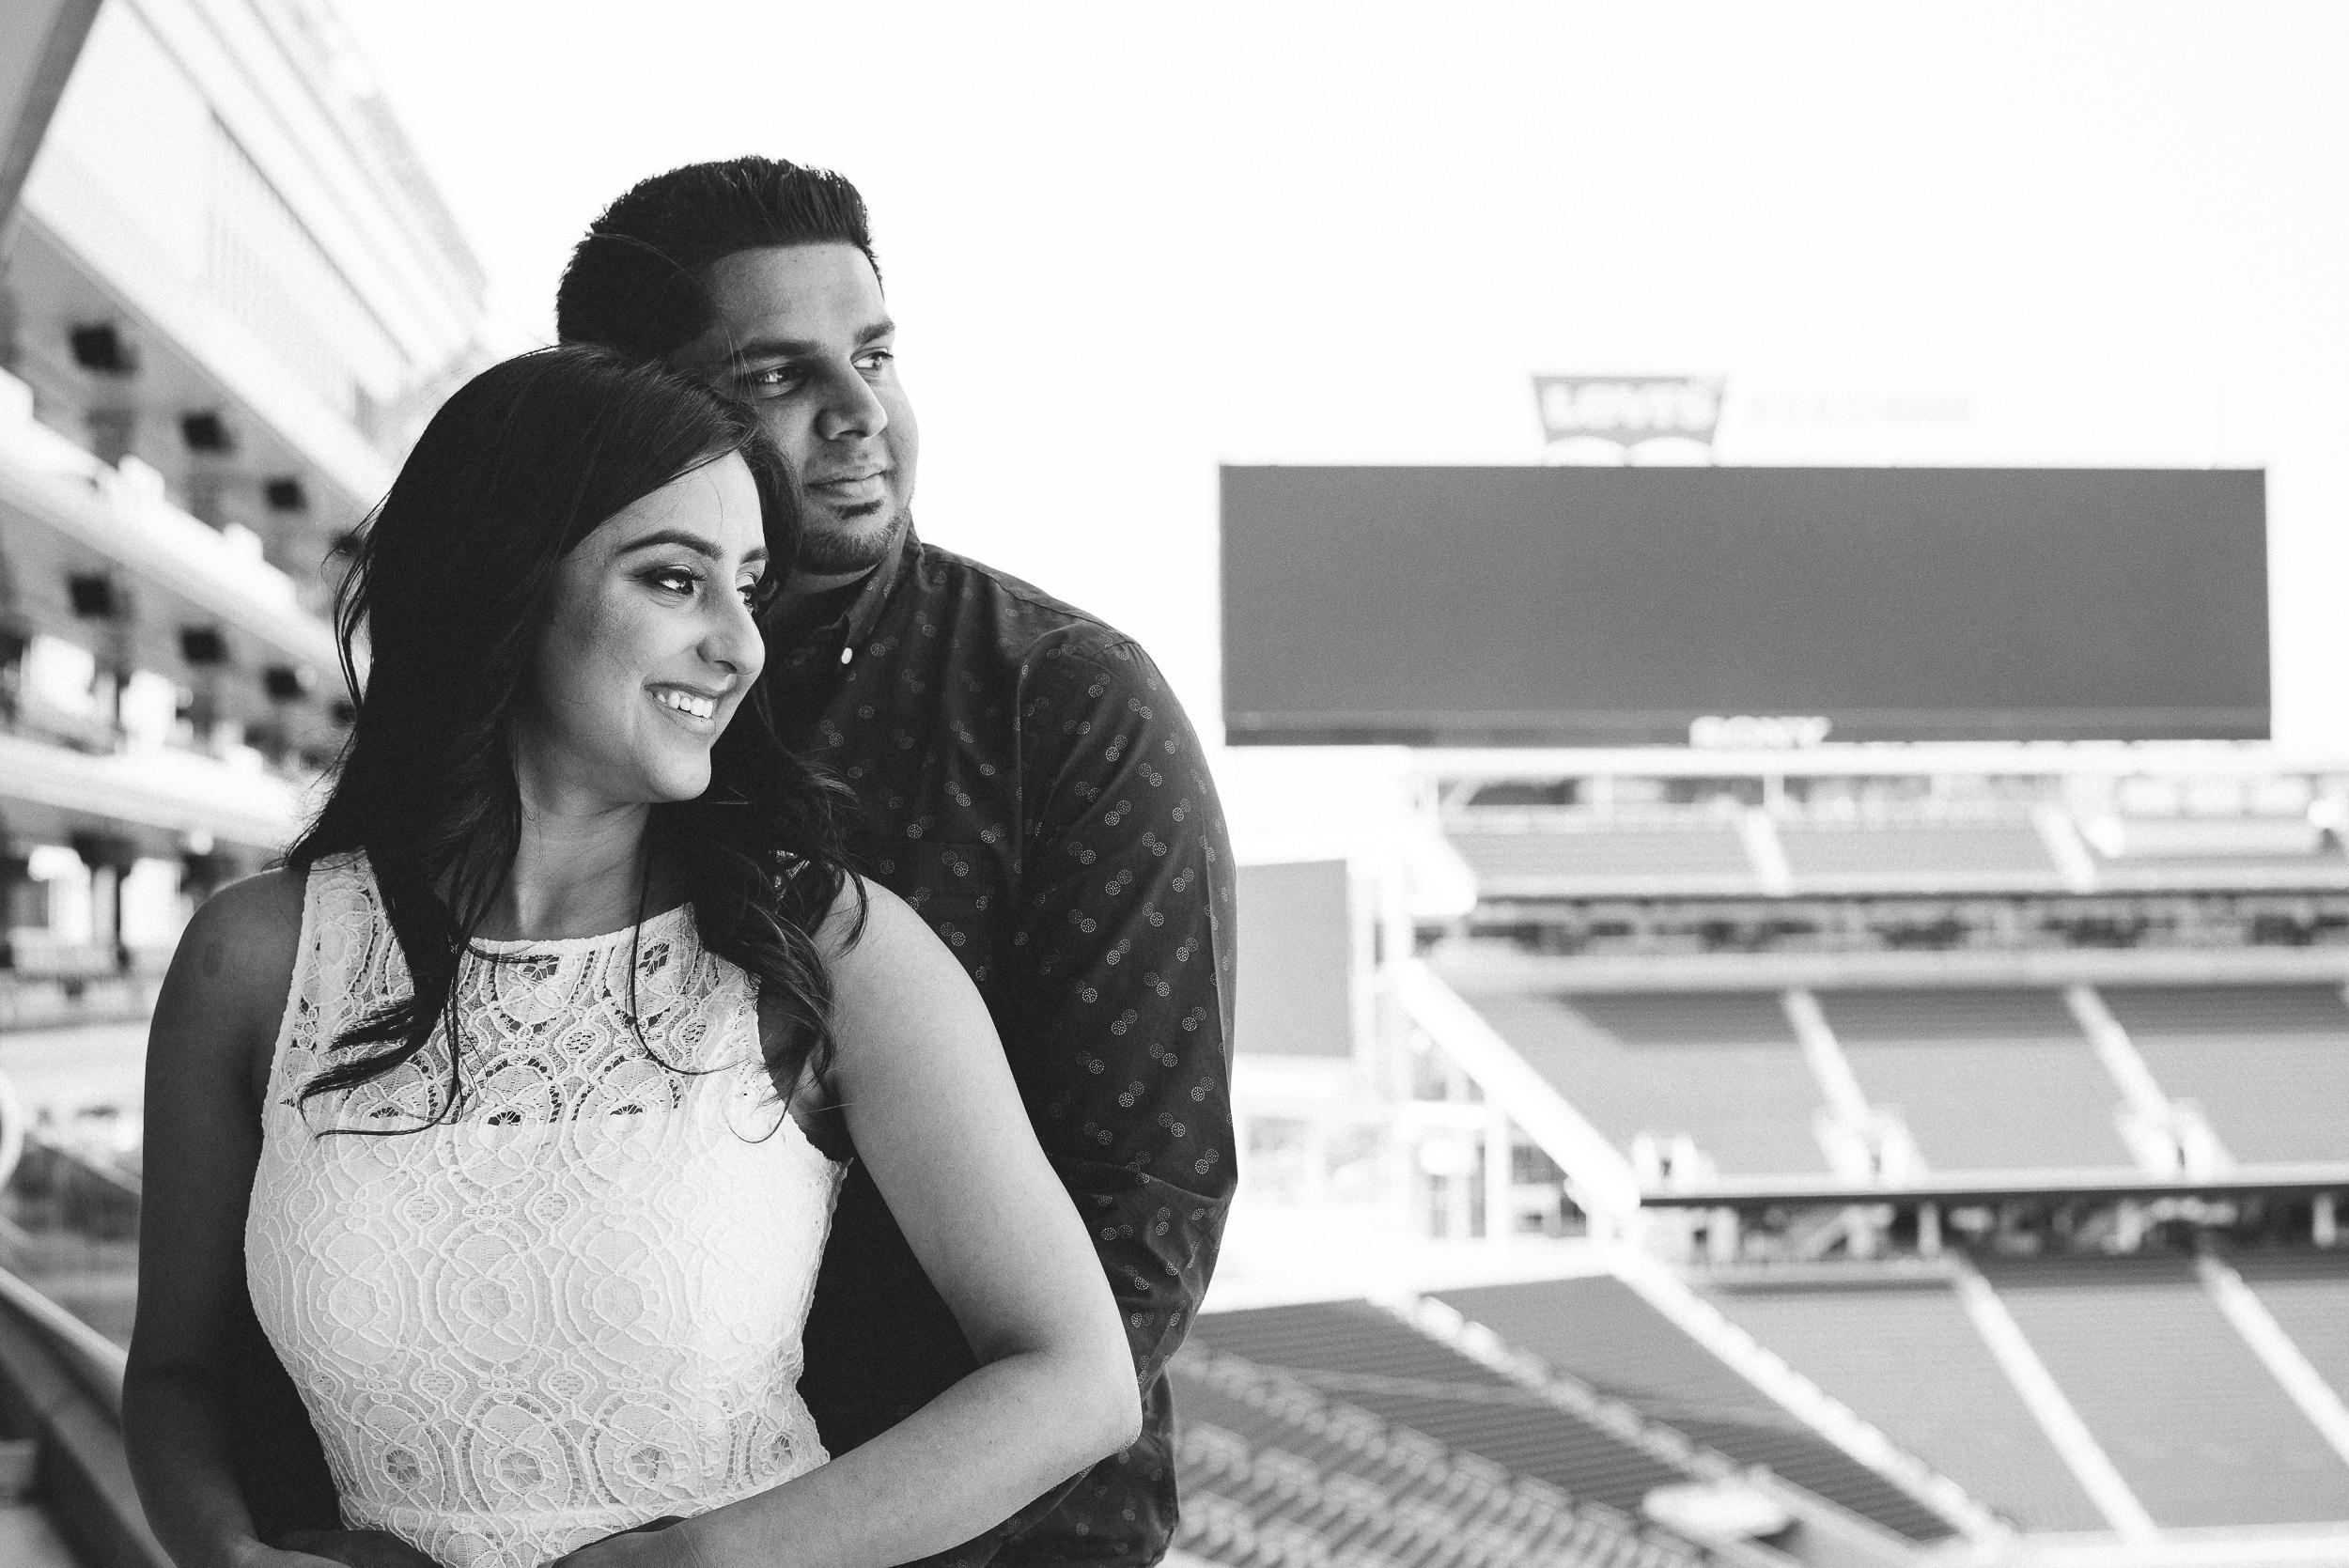 San-Francisco-49ers-Levis-Stadium-Engagement-Photography-014.jpg